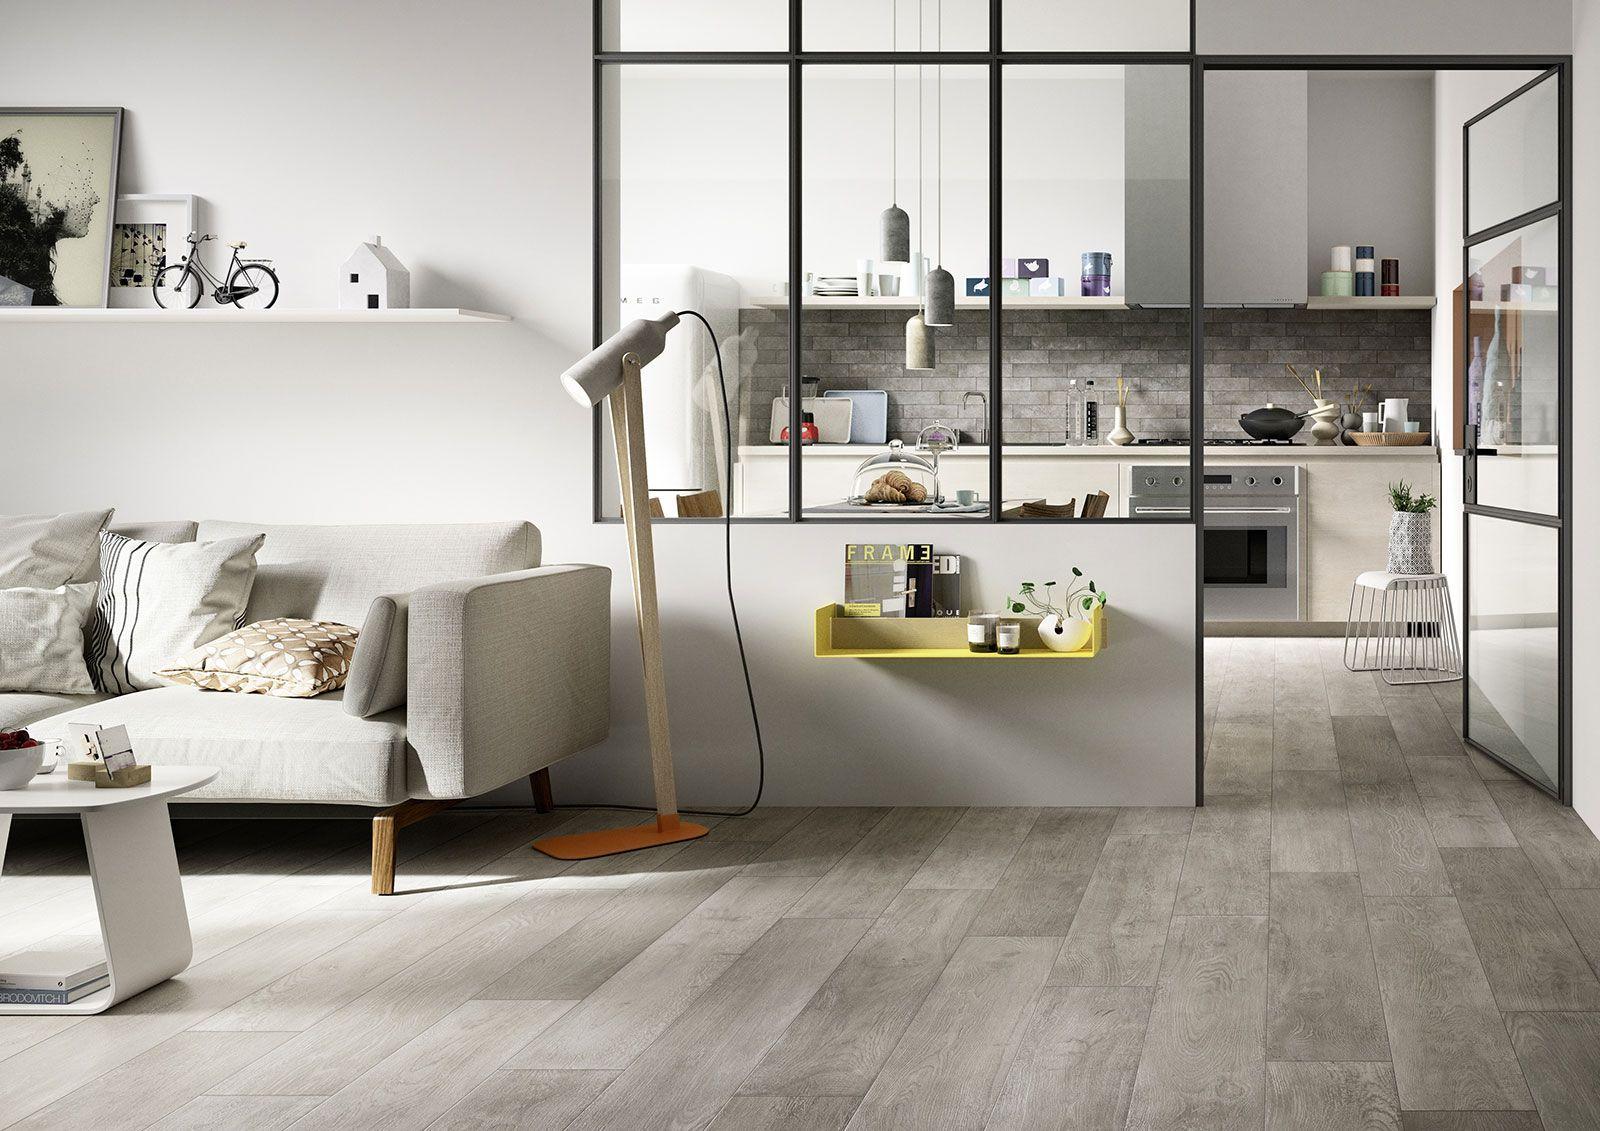 Treverktime u piastrelle per pavimento effetto legno marazzi